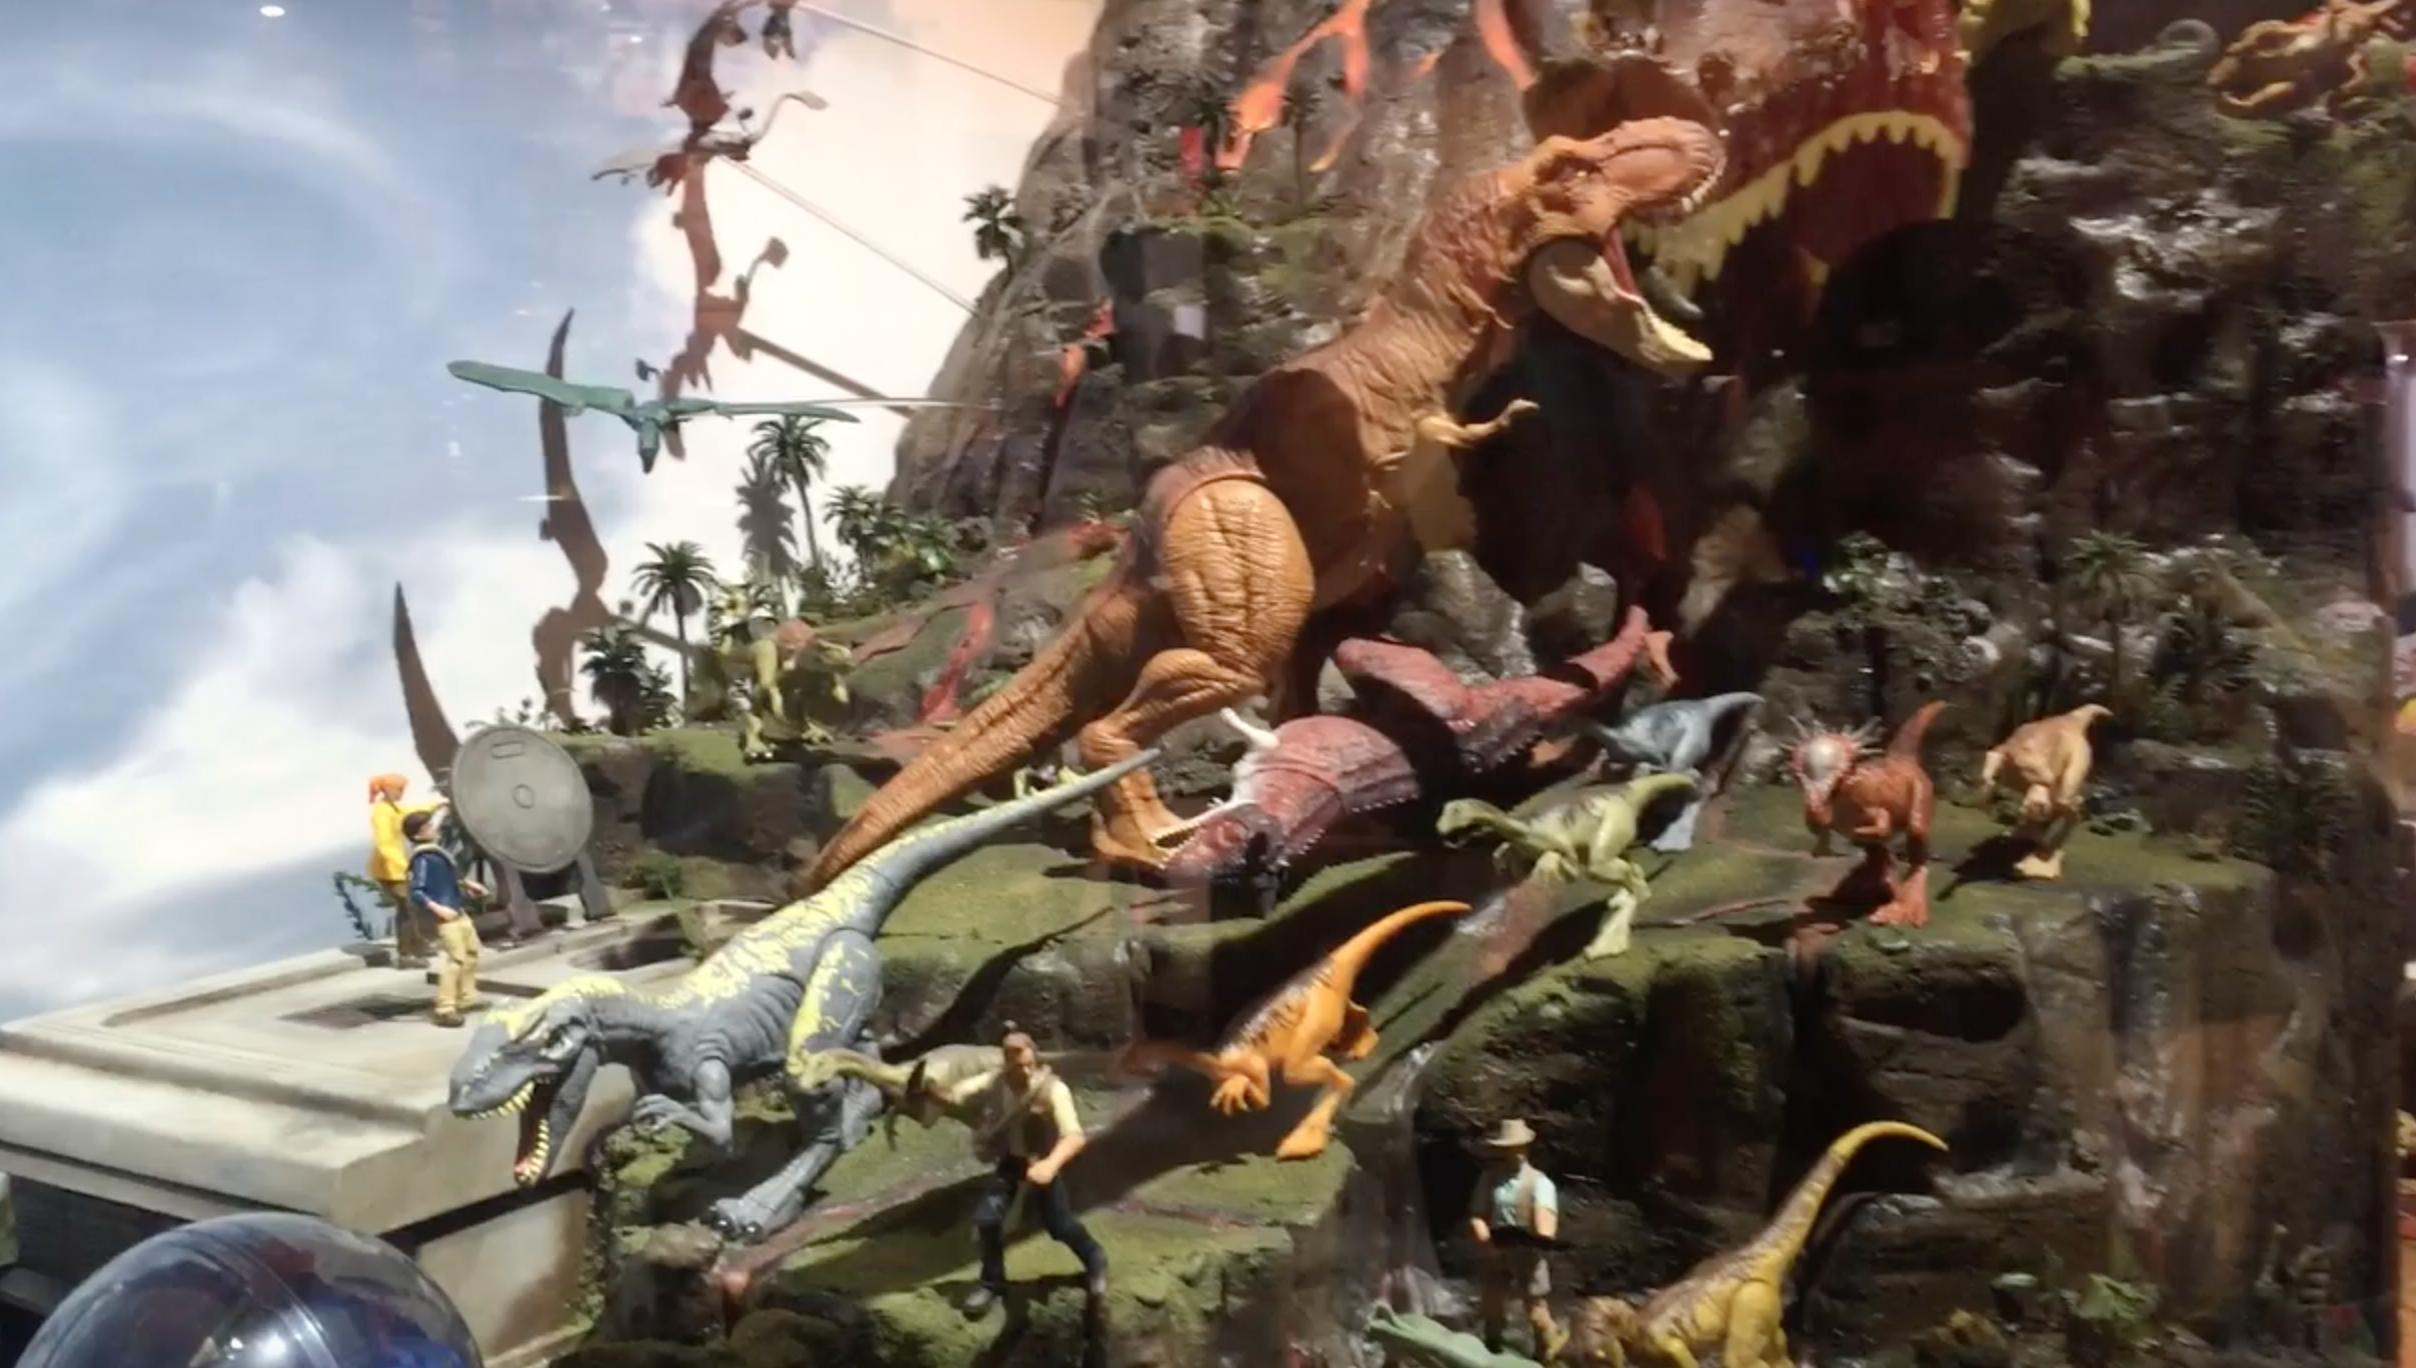 Mattel SDCC 2018 – Jurassic World Diorama Video Walkthrough